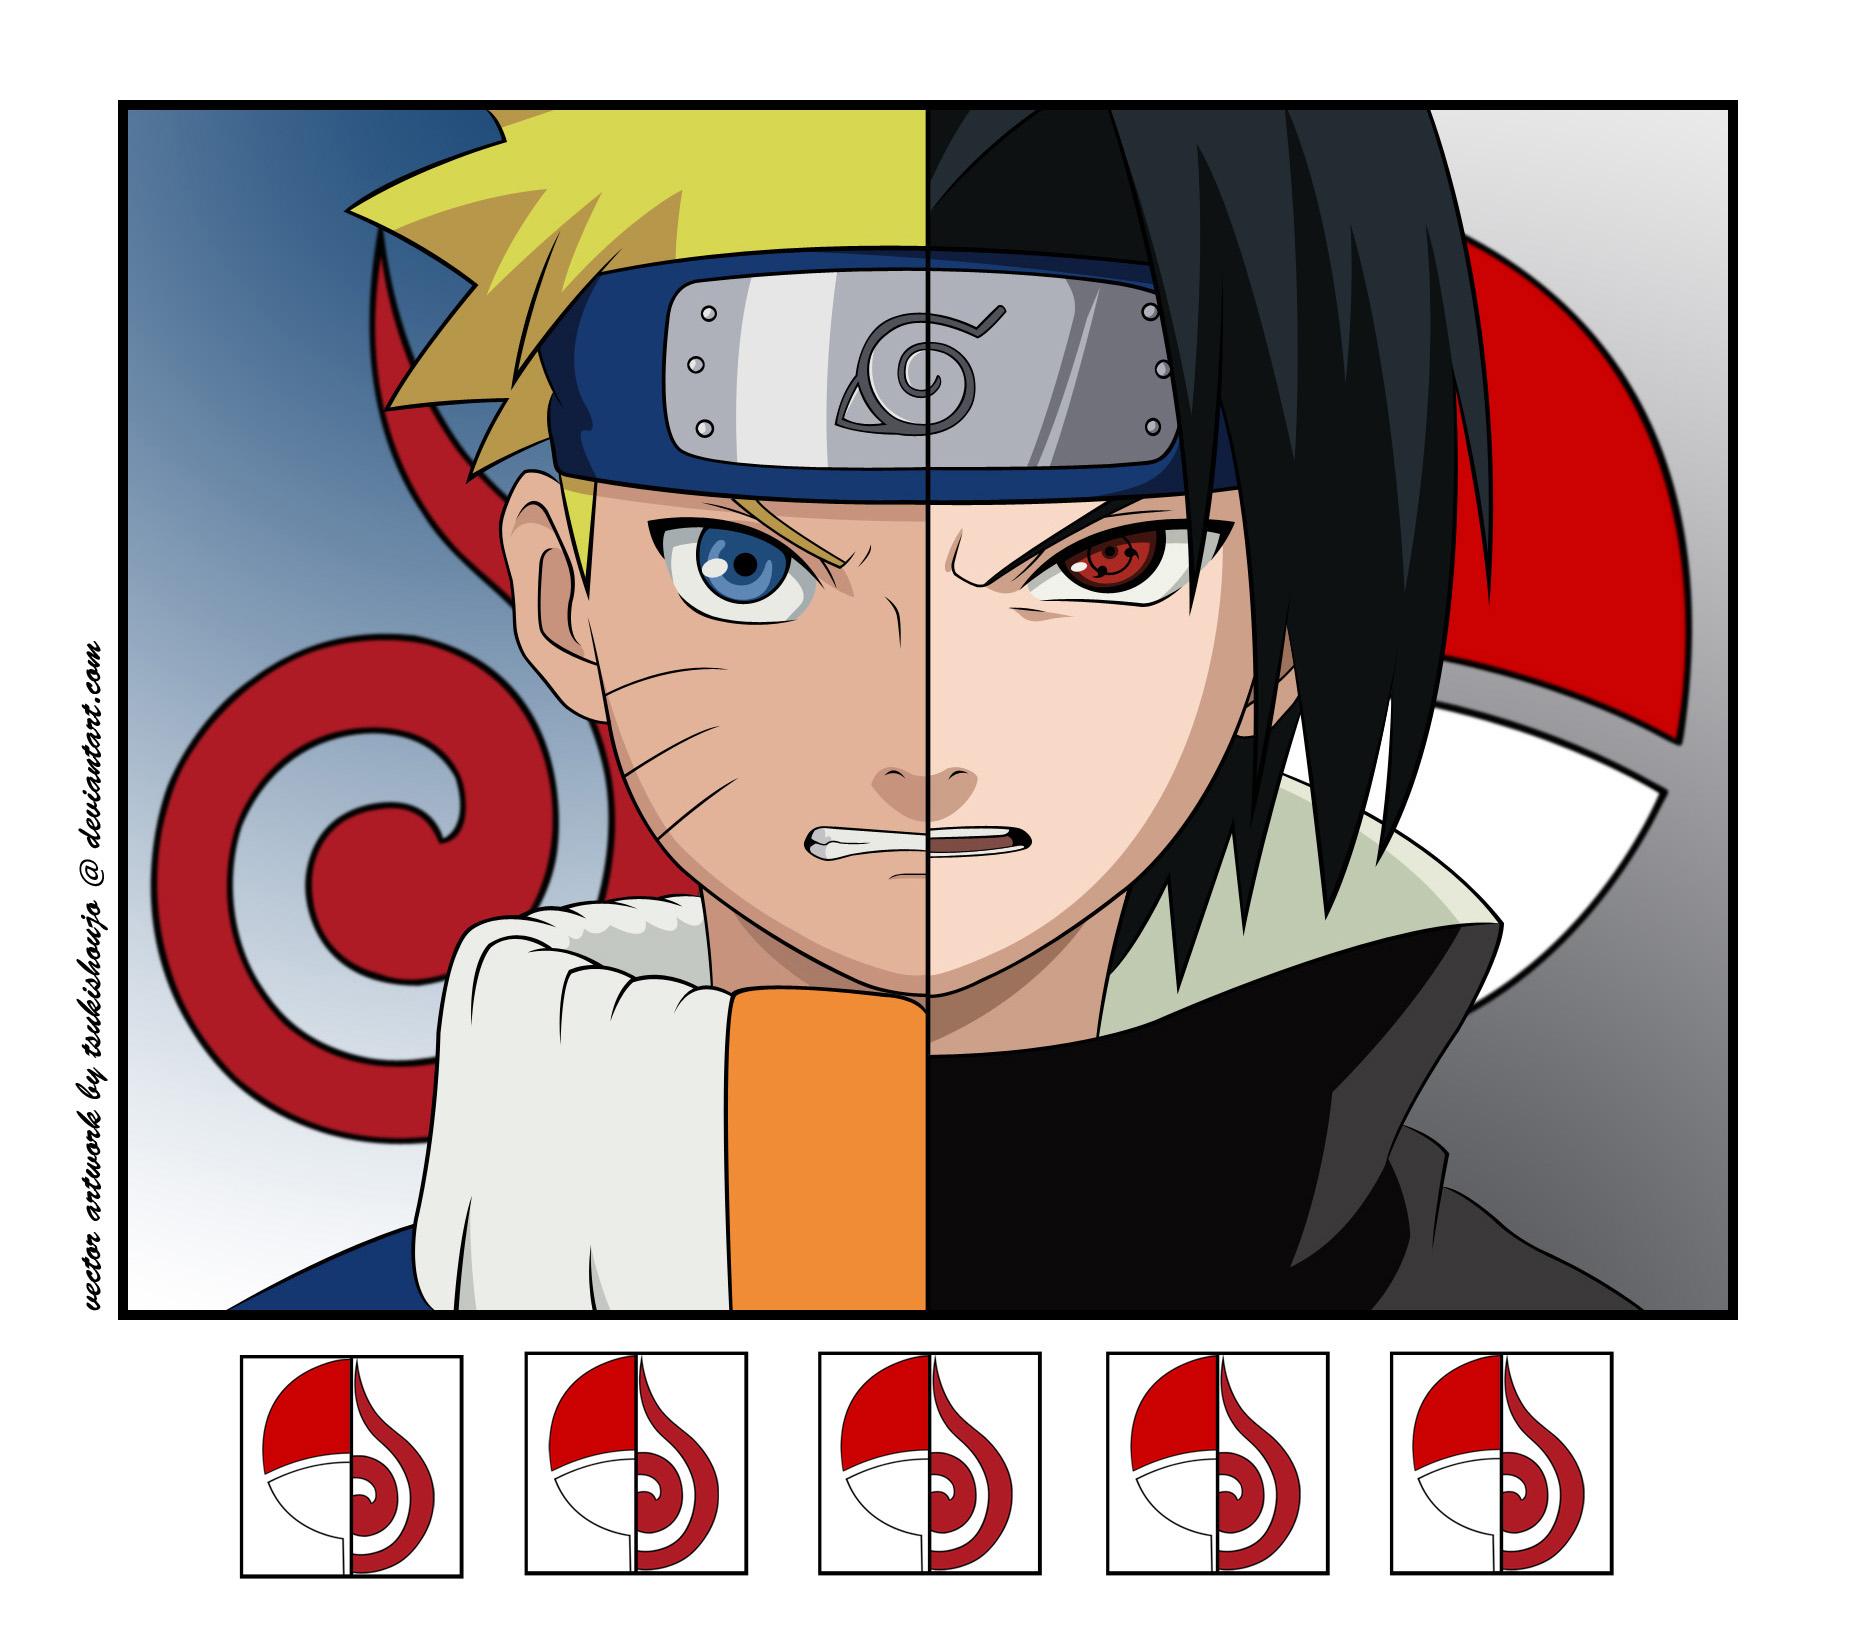 naruto vs sasuke all photos